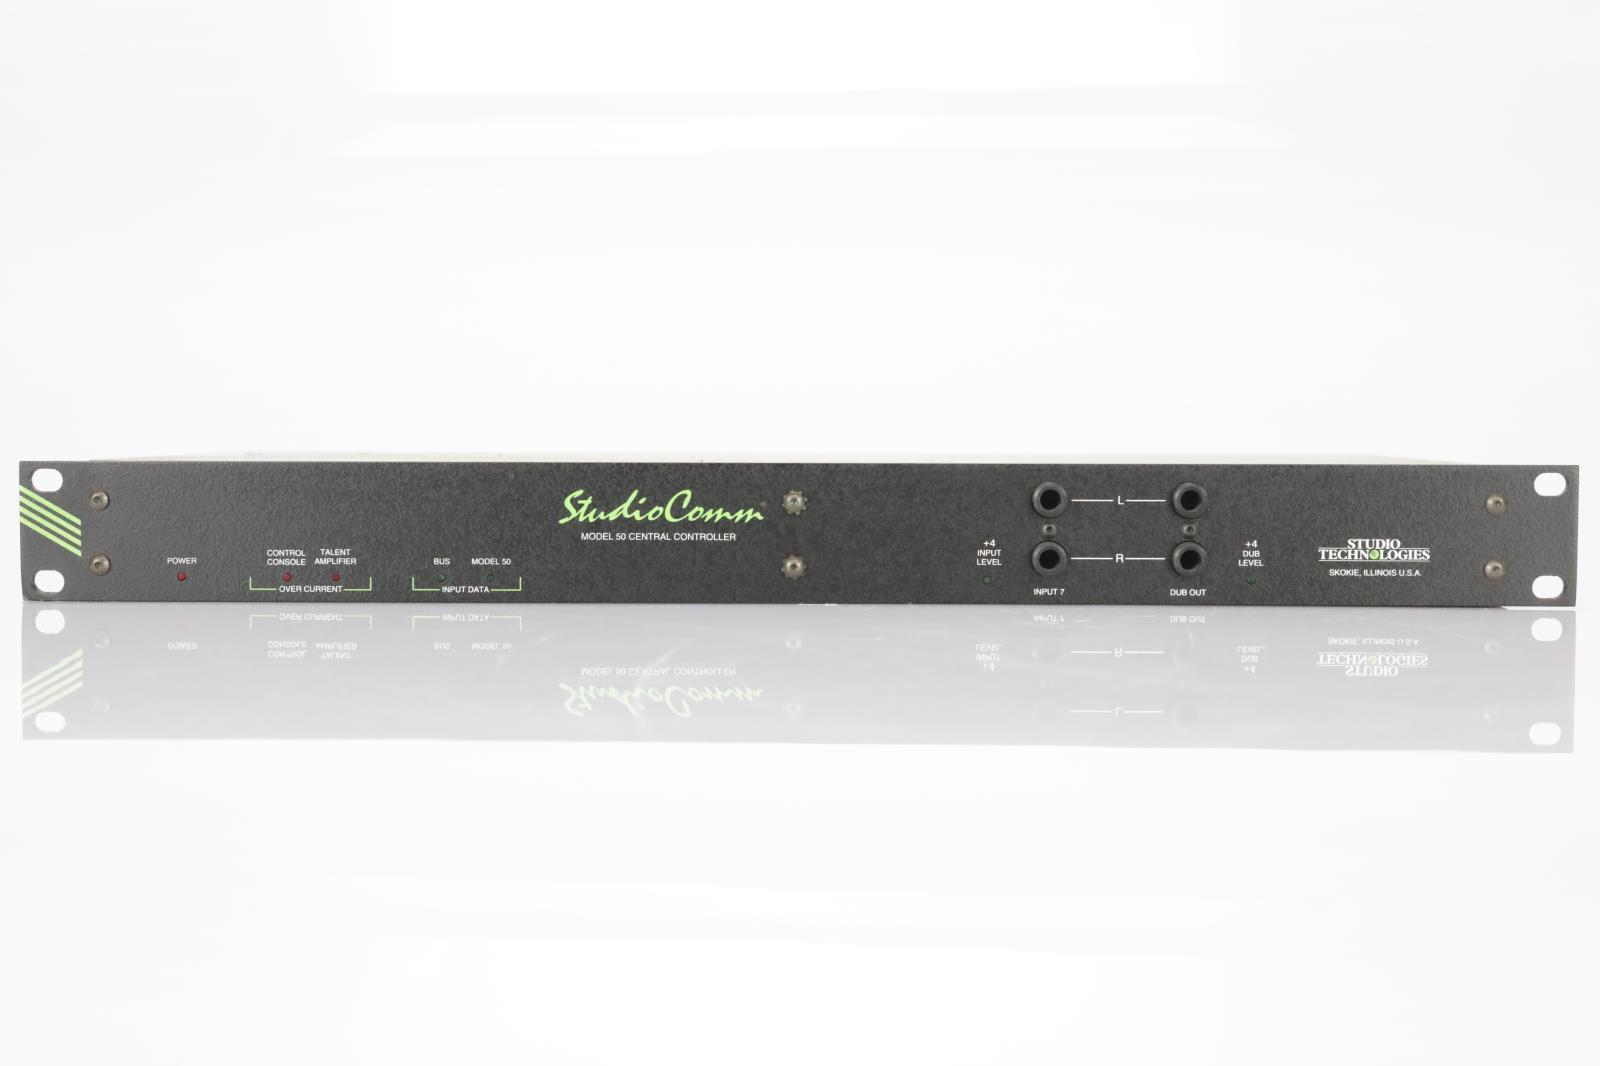 Studio Technologies StudioComm Model 50 Central Controller for Surround #39669